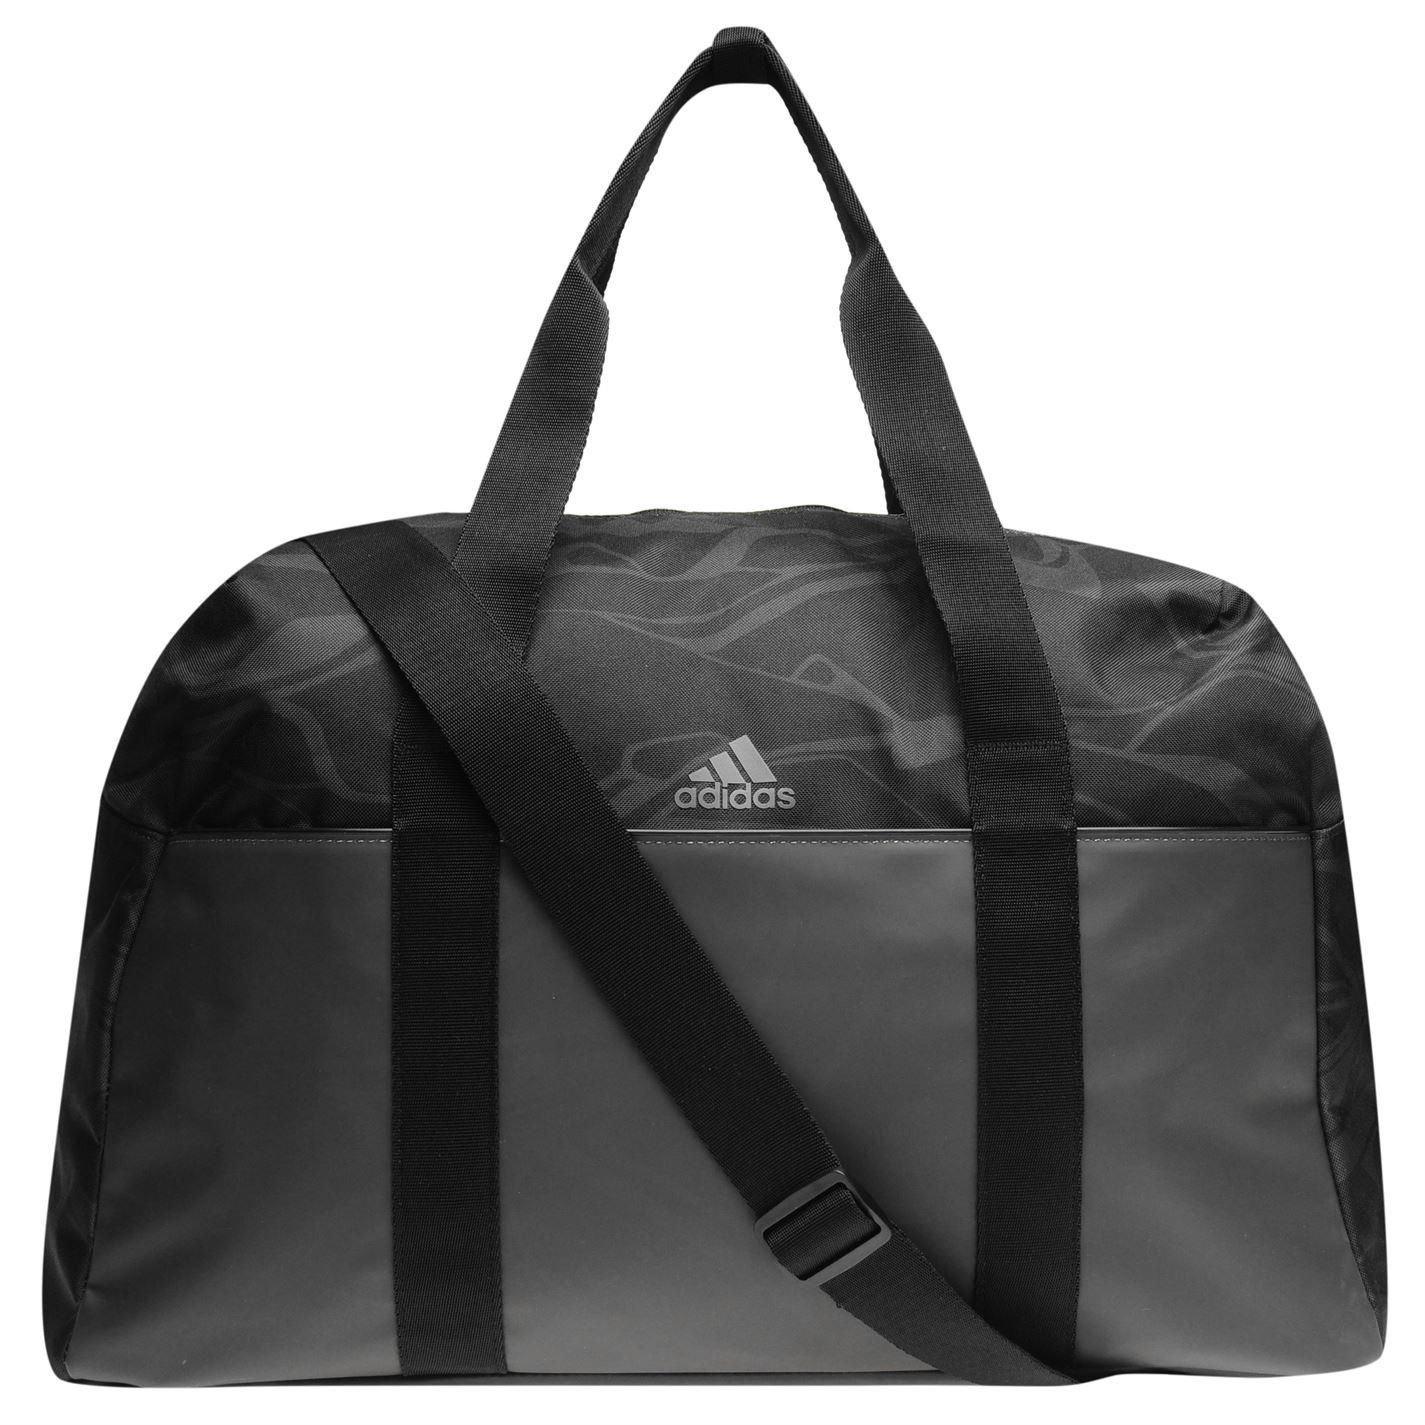 d72917b11 Adidas shoulder bag m66960 levně | Blesk zboží